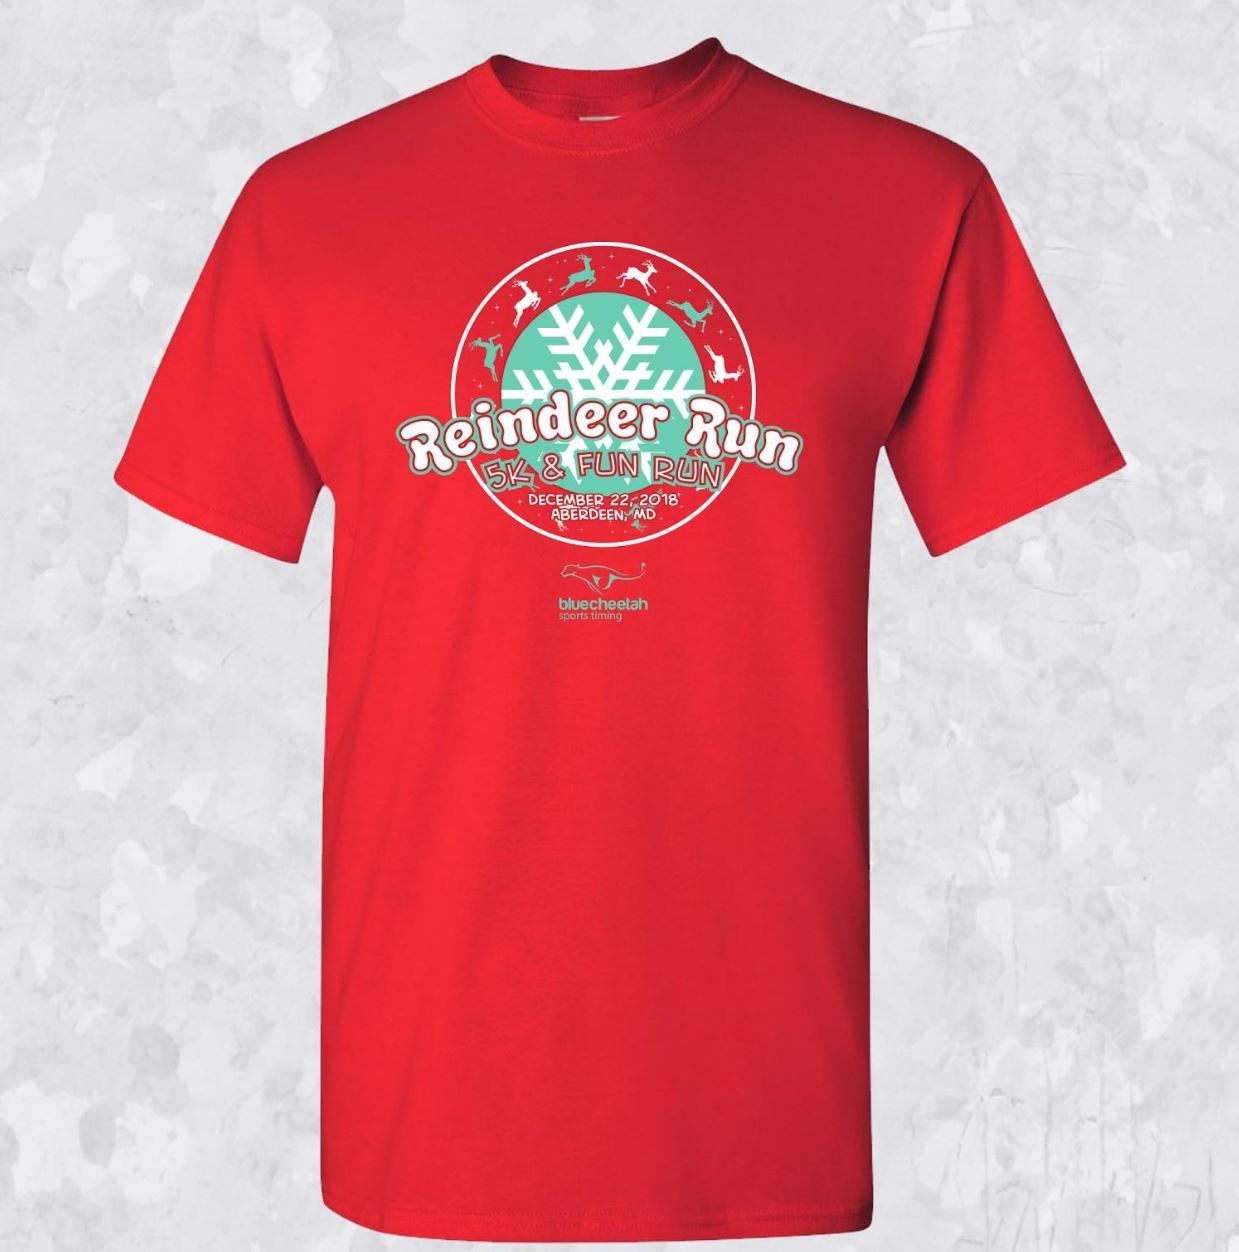 ReindeerRun5K Run & 1 Mile Fun Run/Walk